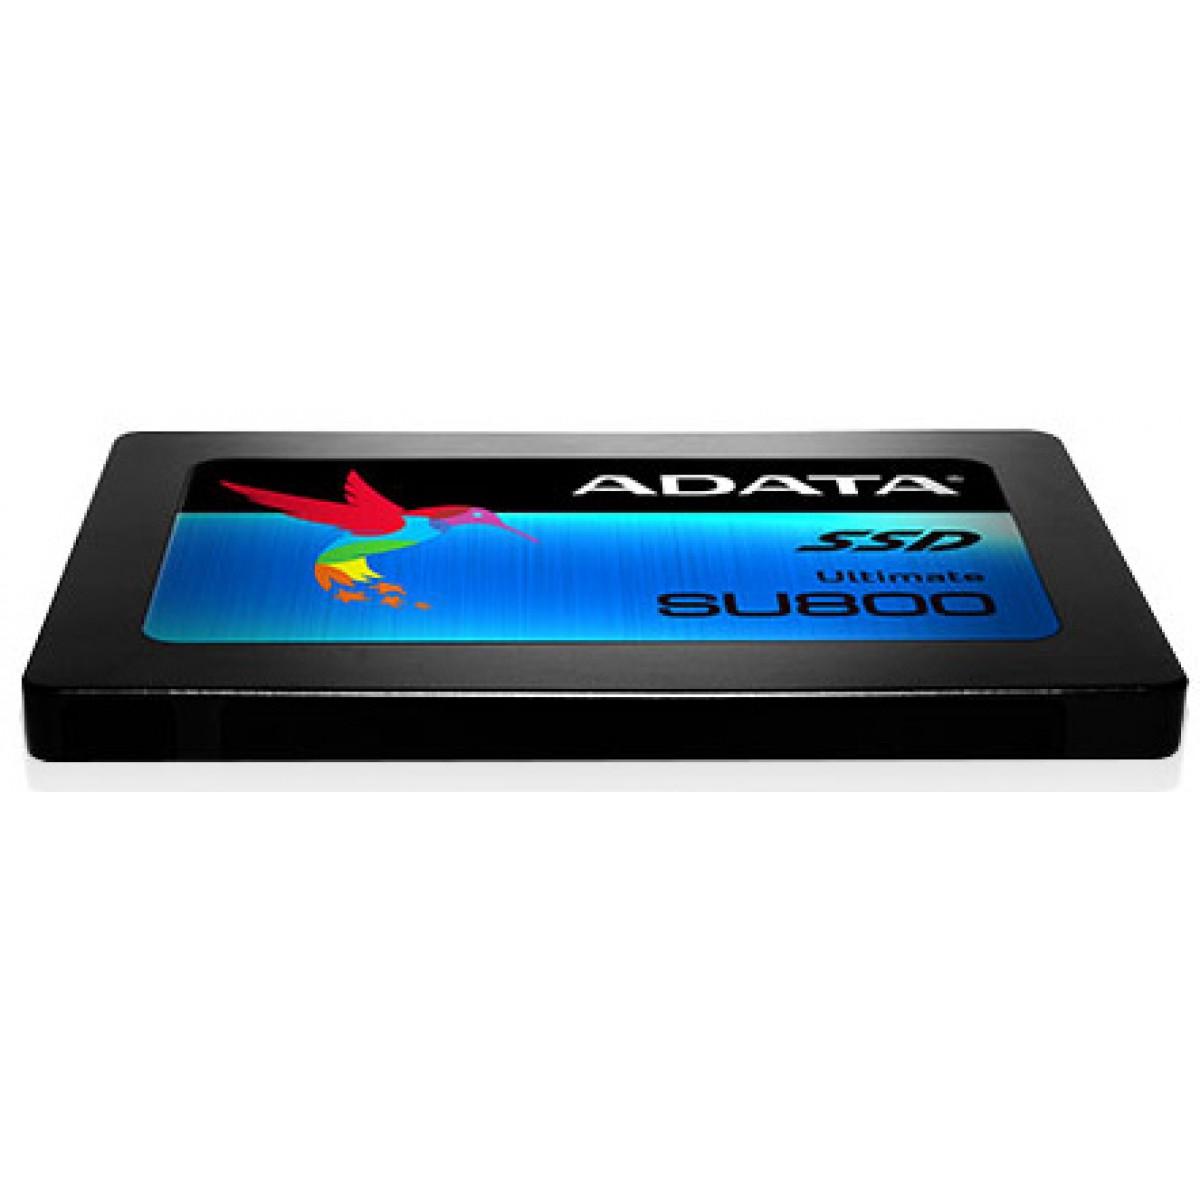 SSD ADATA Ultimate SU800 512GB ASU800SS-512GT-C SATA III LEITURA 560MB/S E GRAVAÇÃO 520MB/S, ASU800SS-512GT-C